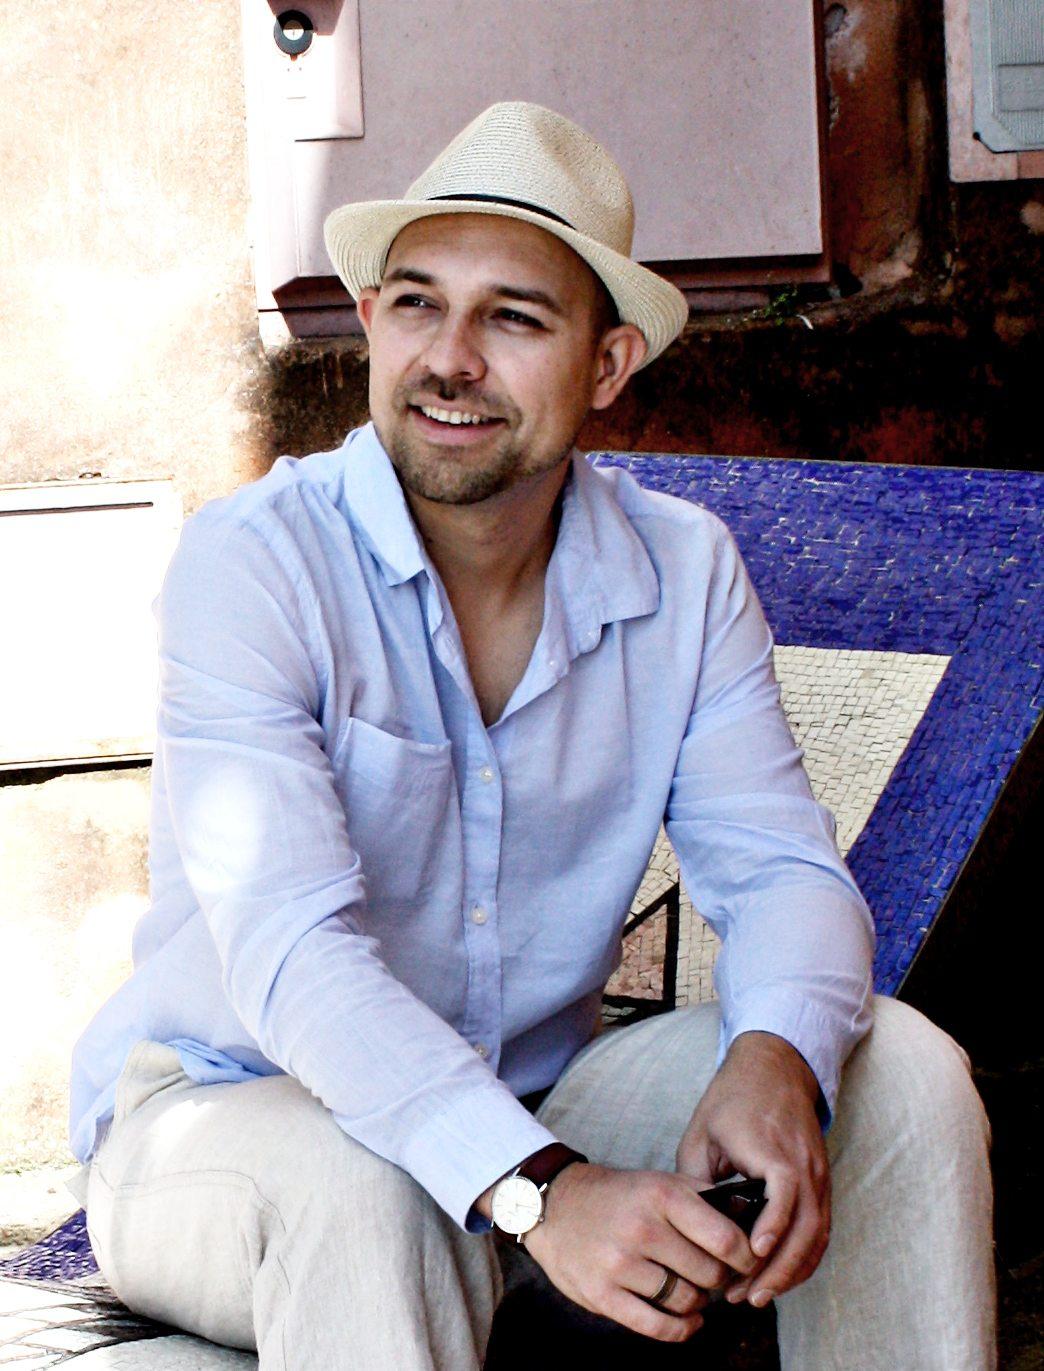 Filip Valica - Entrepreneur